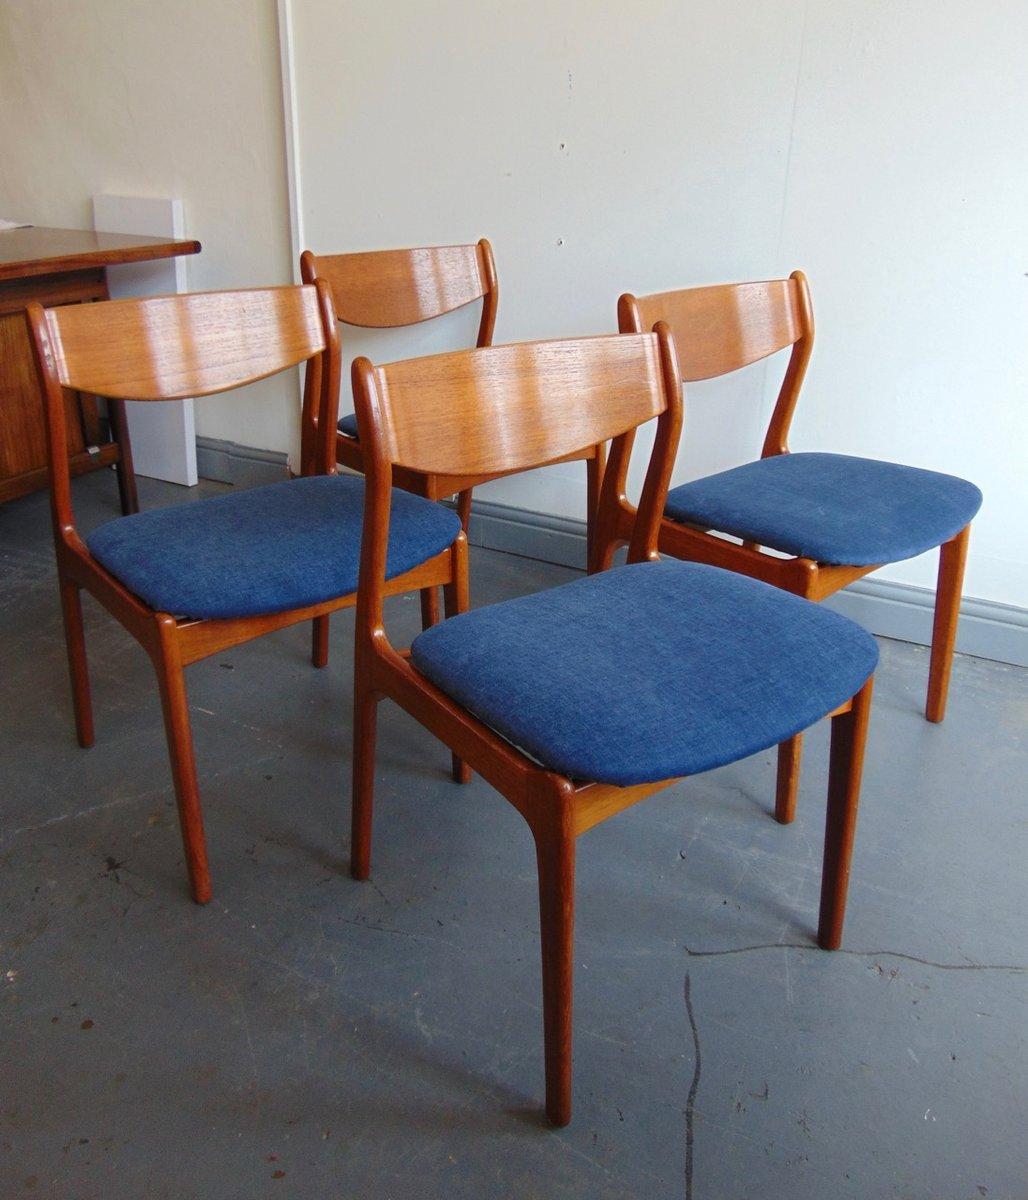 Vintage Teak Dining Chairs By PE Jorgensen For Farso Stolefabrik Set Of 4 Sale At Pamono